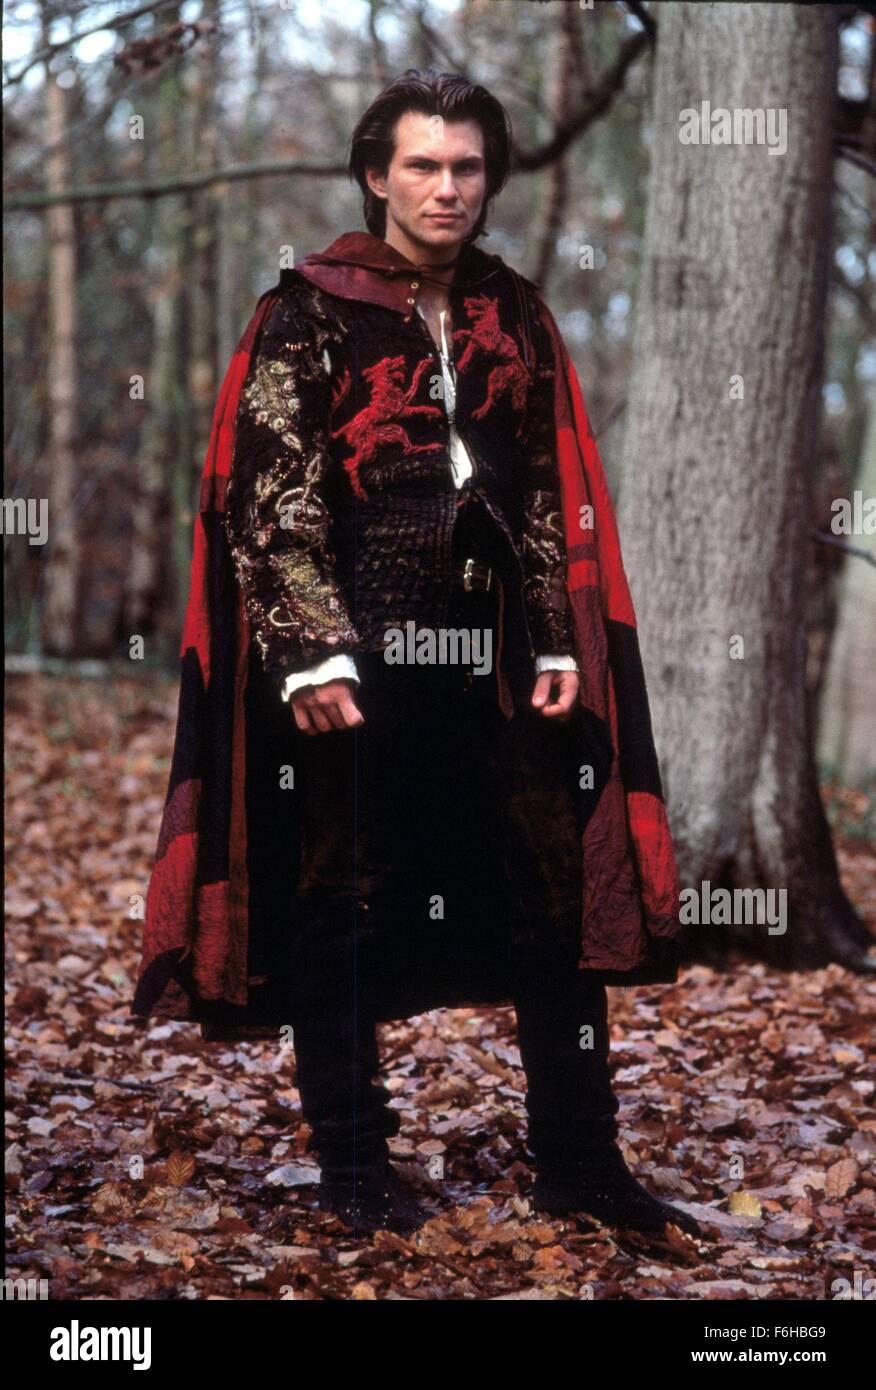 Heathers Christian Slater Costume